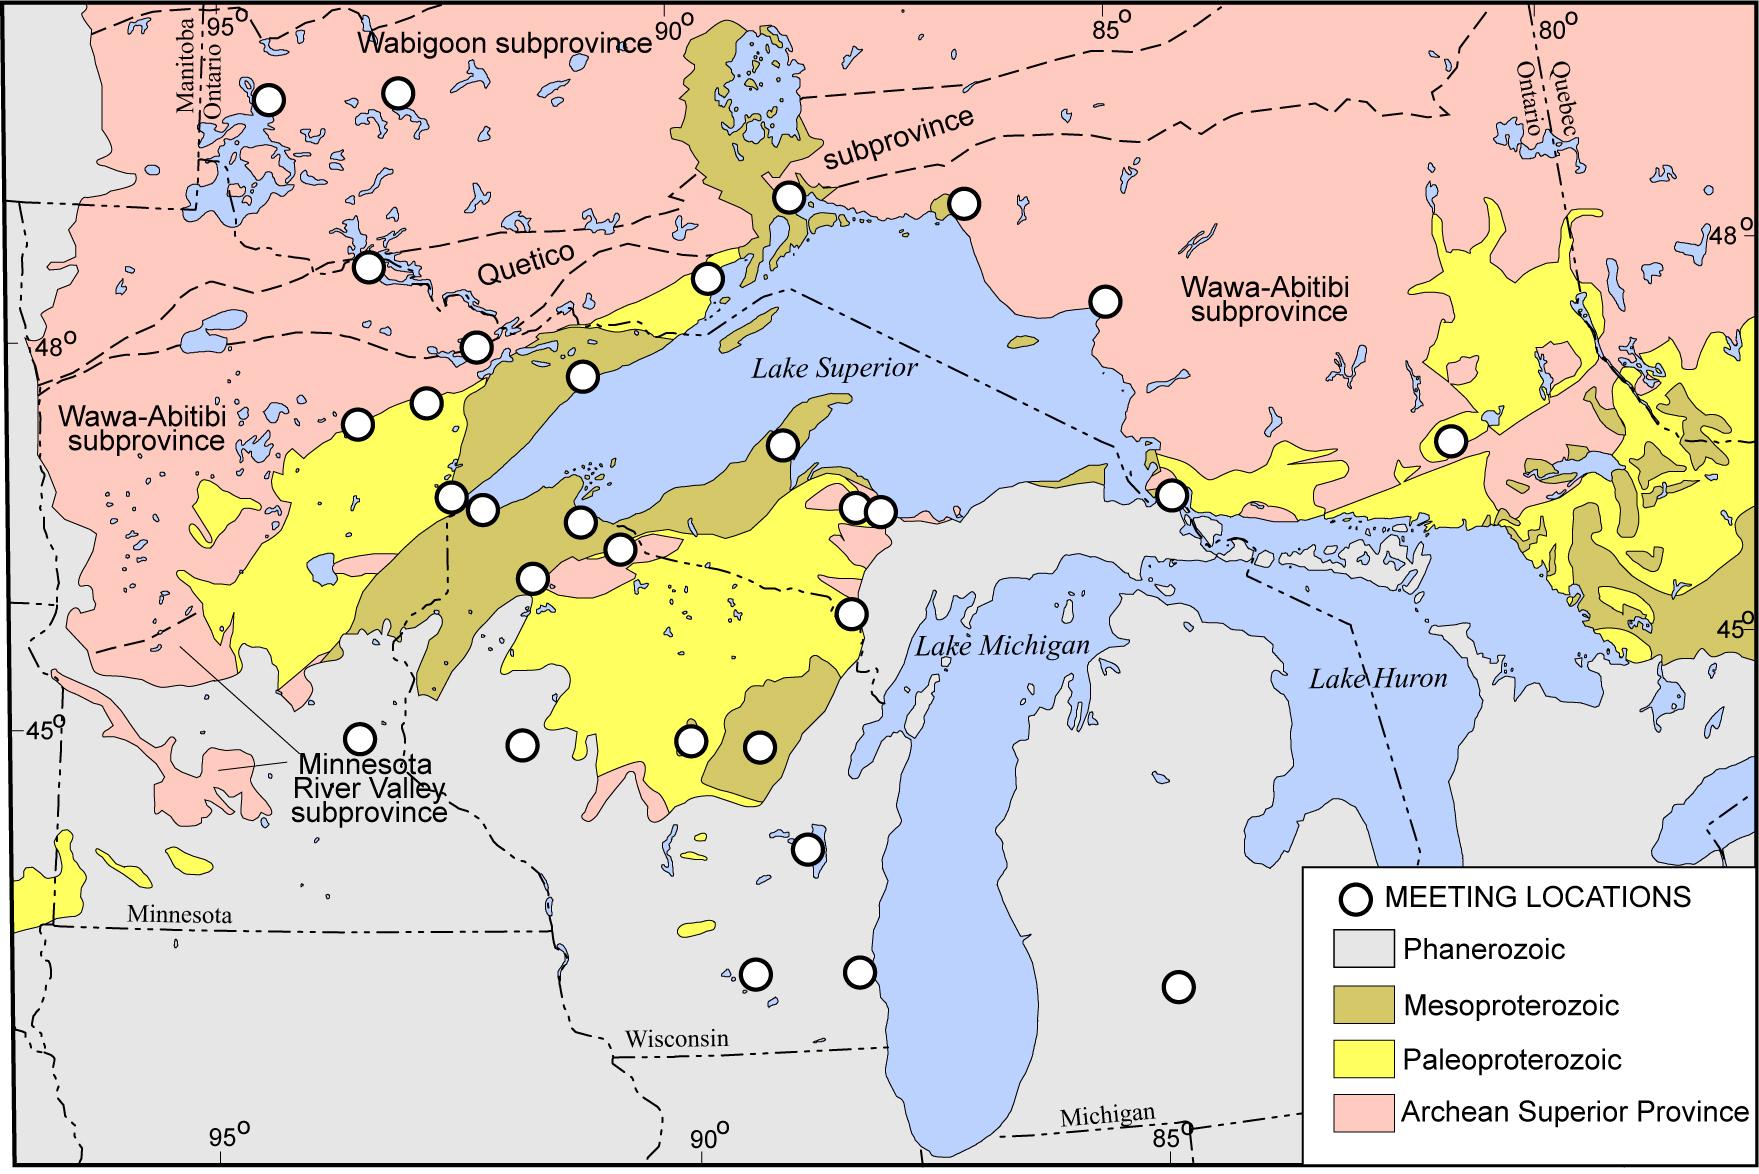 ILSG - Insute History Map Of Lake Superior Area on map of hubbard lake area, map of lake mead area, map of keuka lake area, map of rhine river area, map of superior shipwrecks, map of lake minnetonka area, map of grand lake area, map of houghton lake area, map of flathead lake area, map of blue lake area, map of the north sea area, map of lake chelan area, map of saginaw bay area, map of bass lake area, map of lake wenatchee area, map of lake texoma area, map of iowa area, map around lake superior, map of south lake area, map of kentucky lake area,